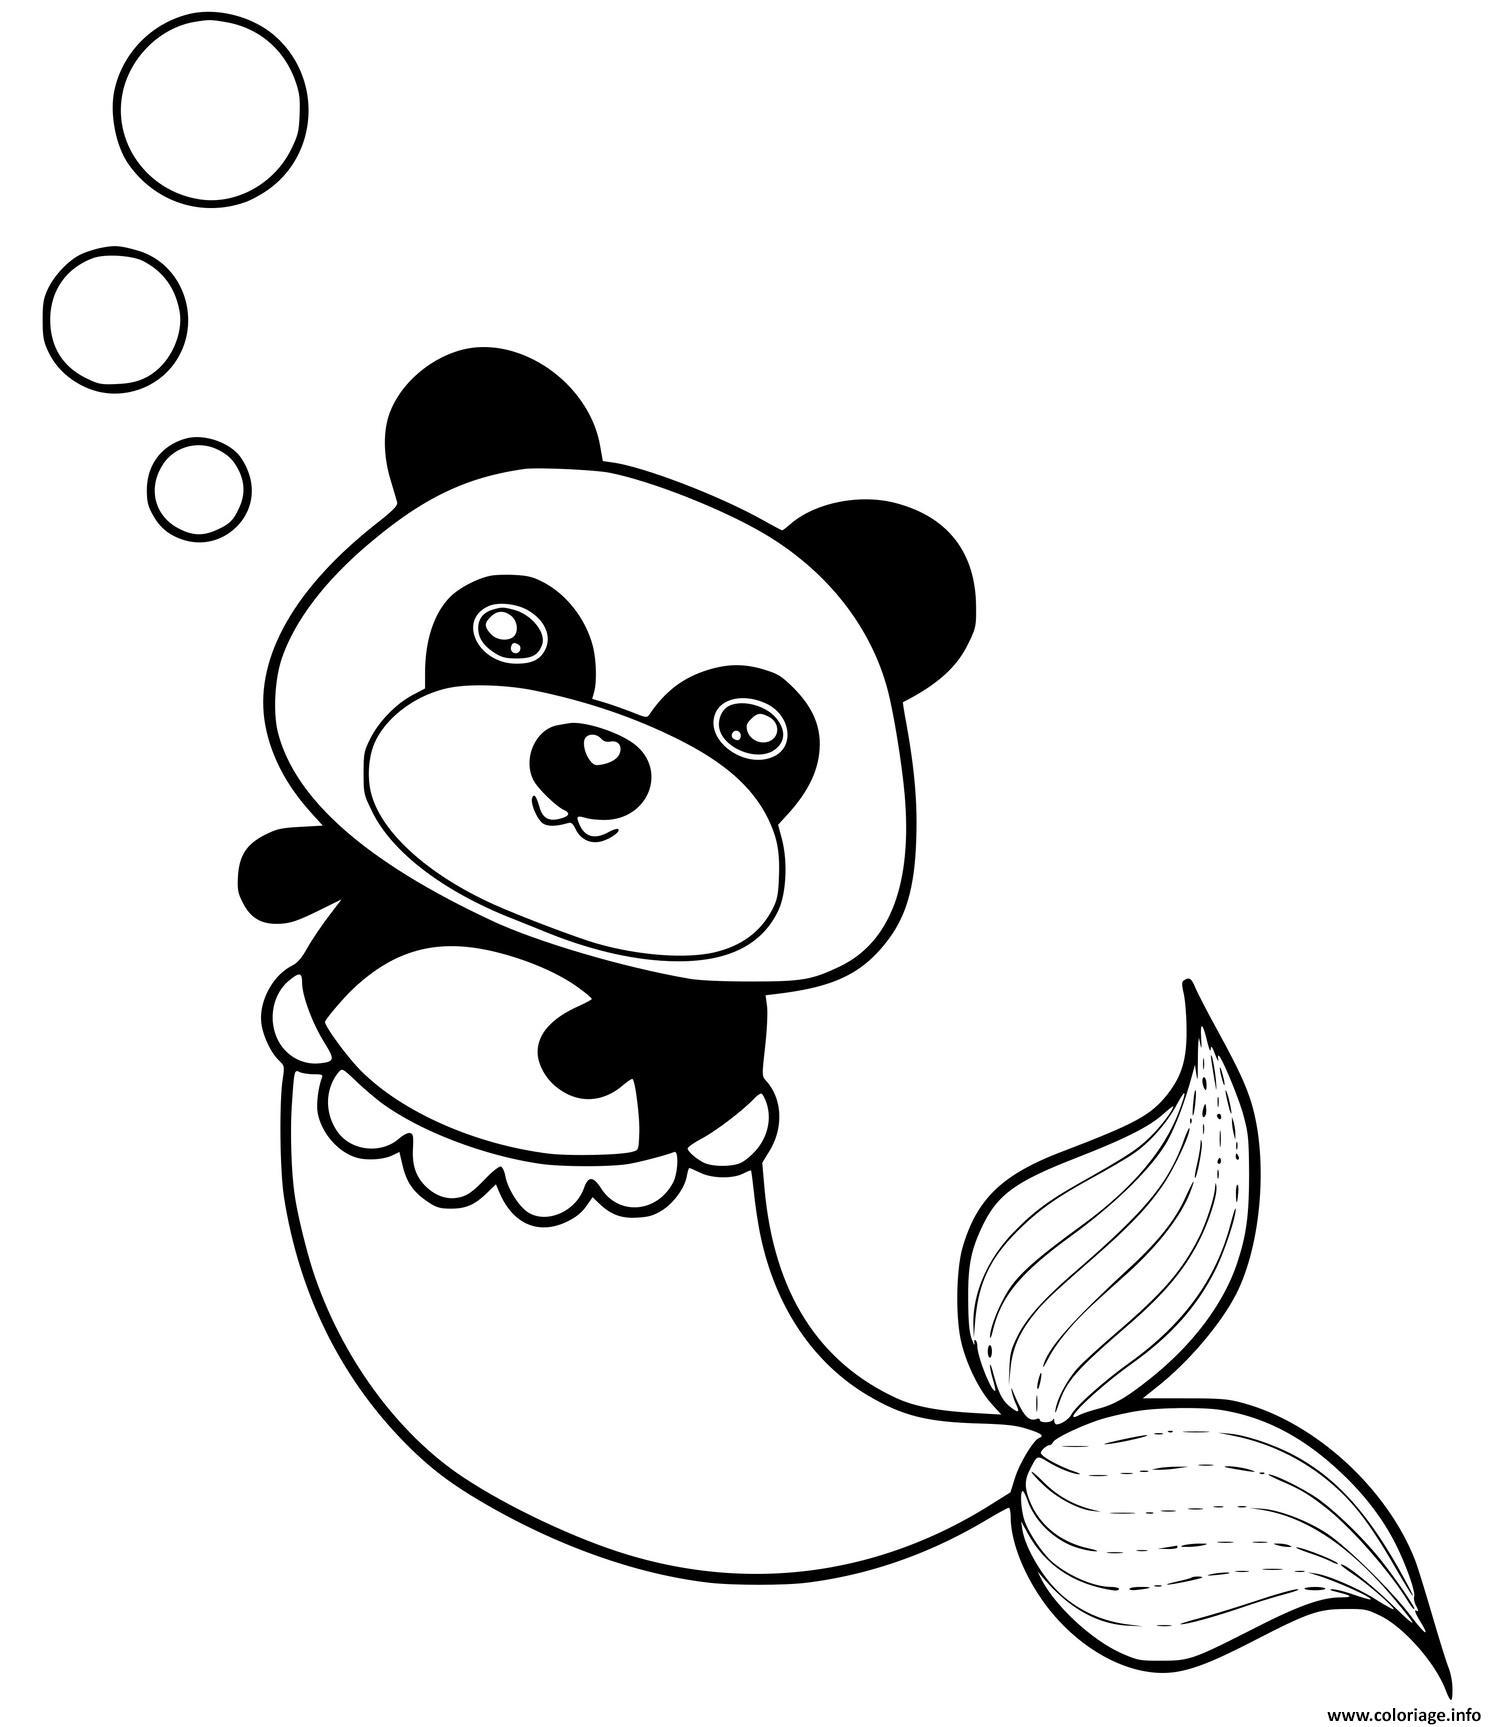 Dessin panda sirene mermaid Coloriage Gratuit à Imprimer